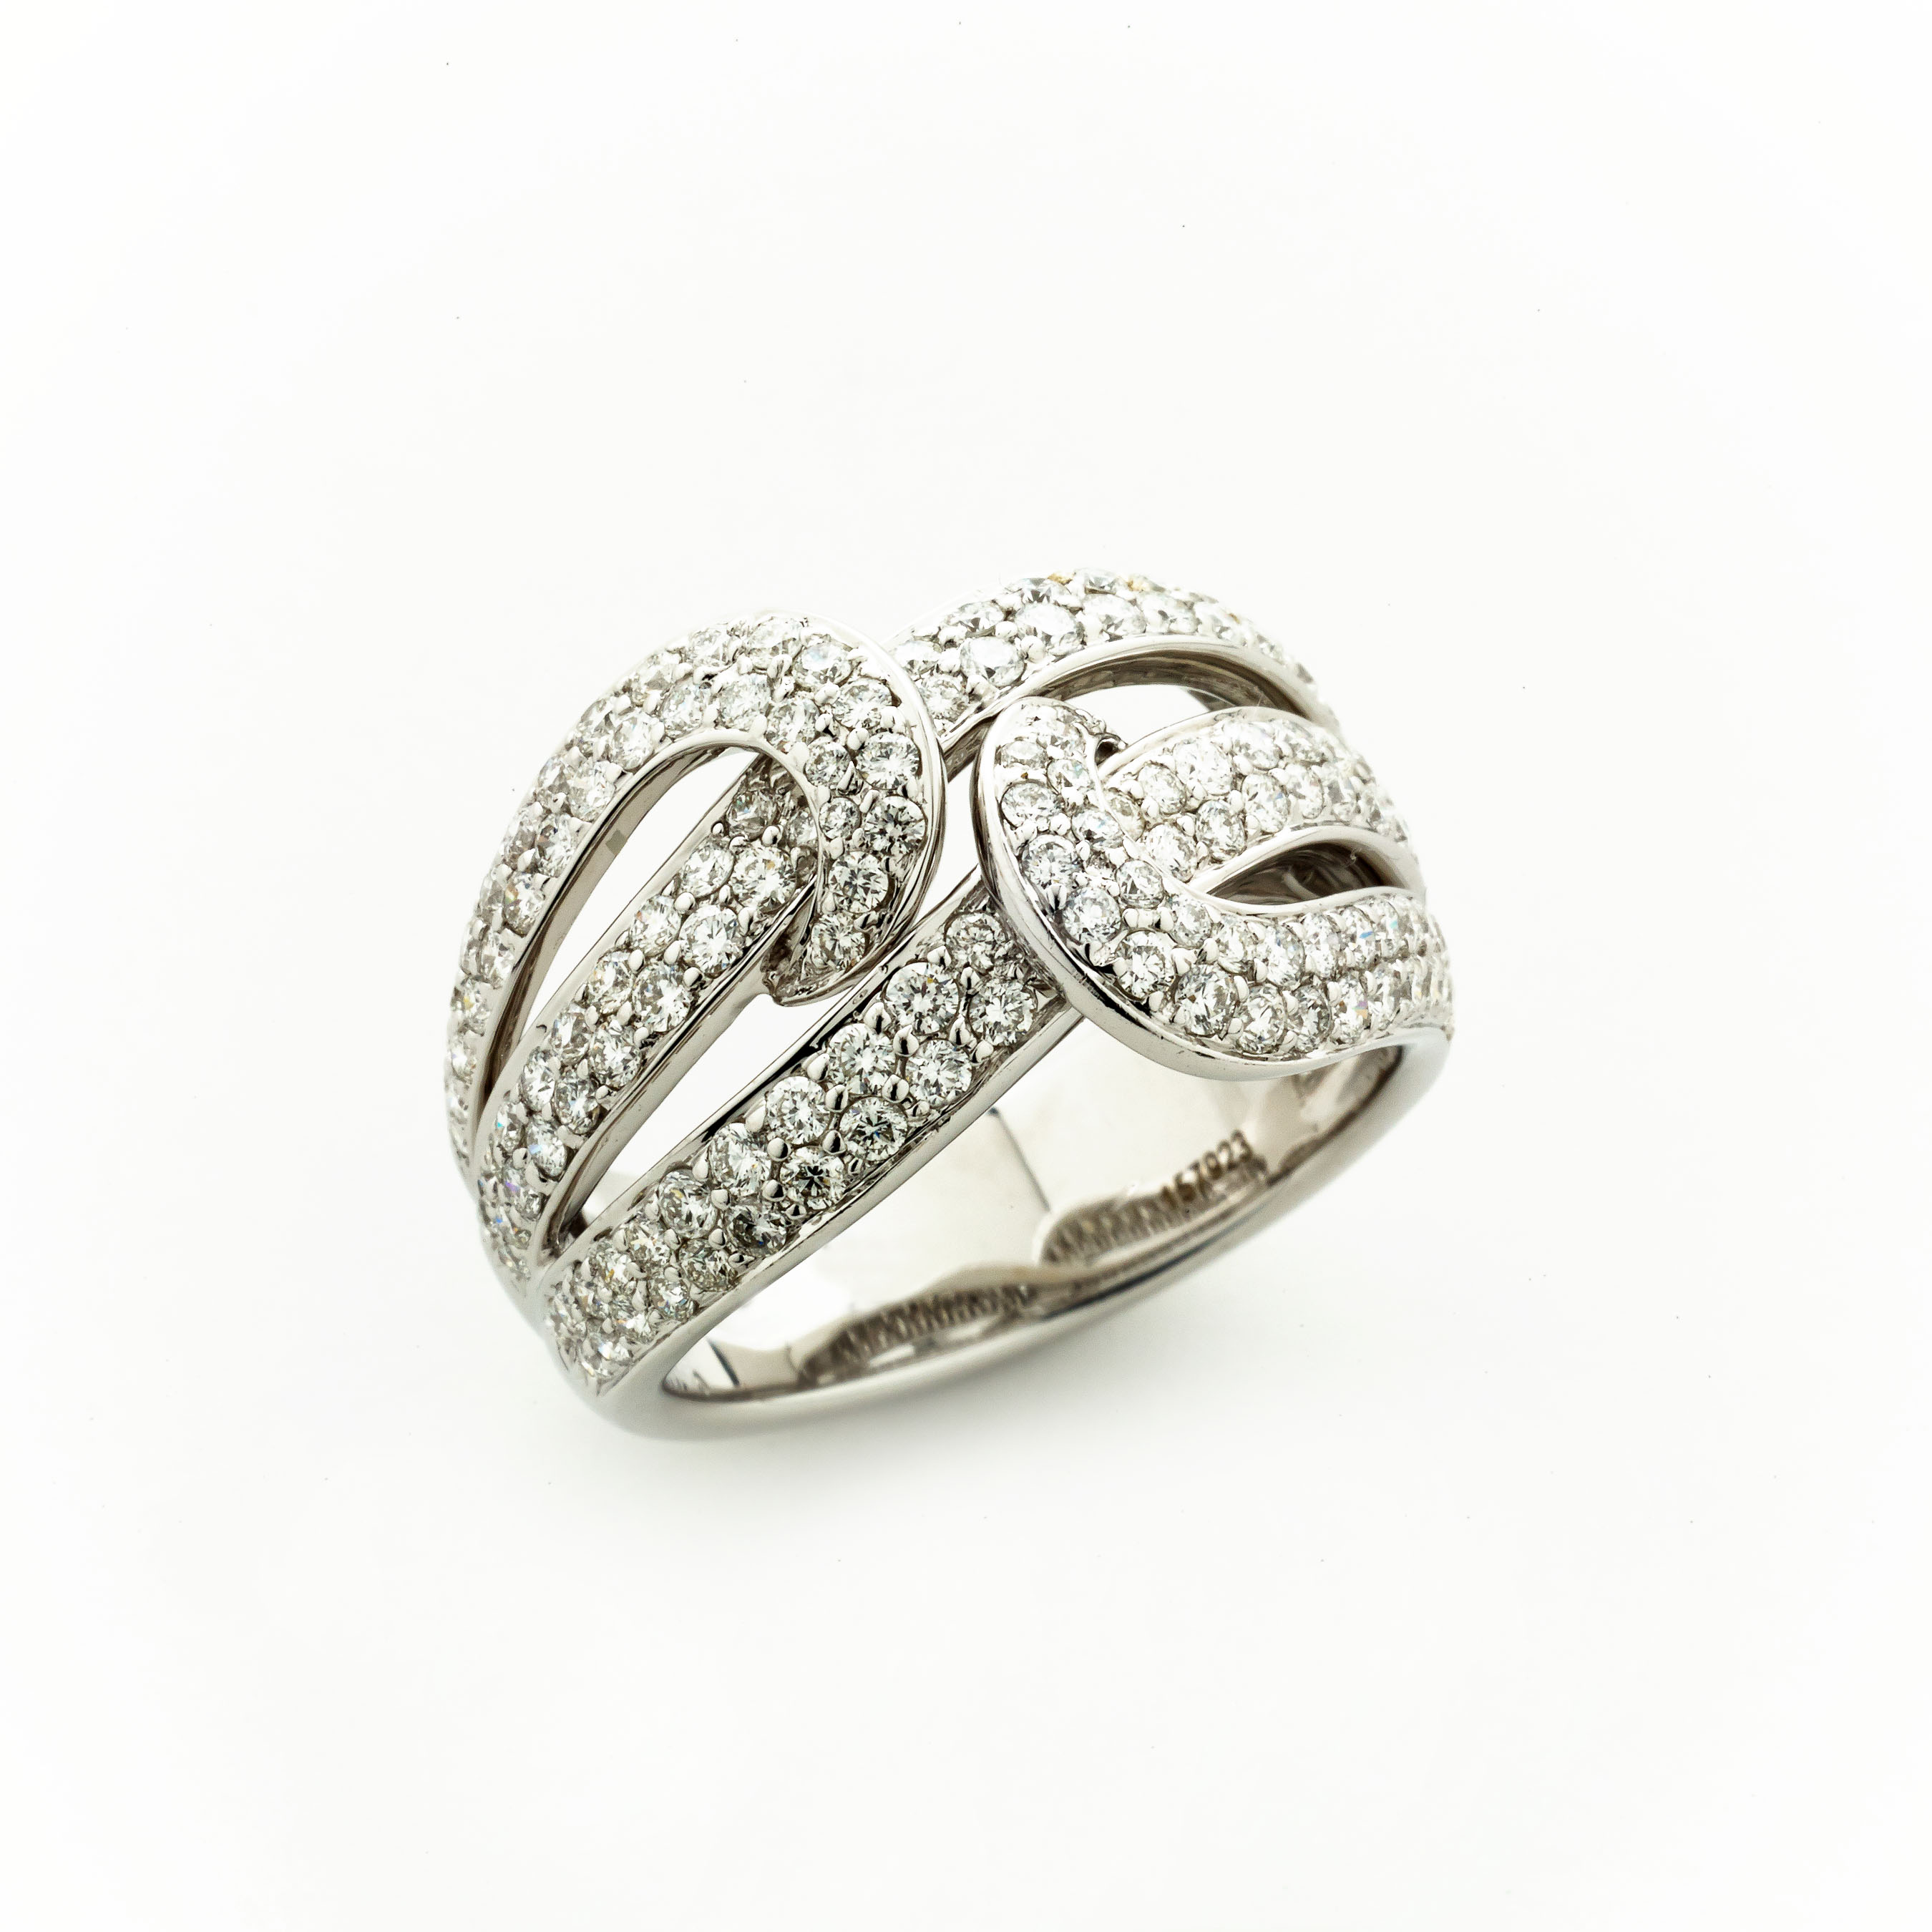 "Swirl"" Diamond Ring Elizabeth Bruns Inc"